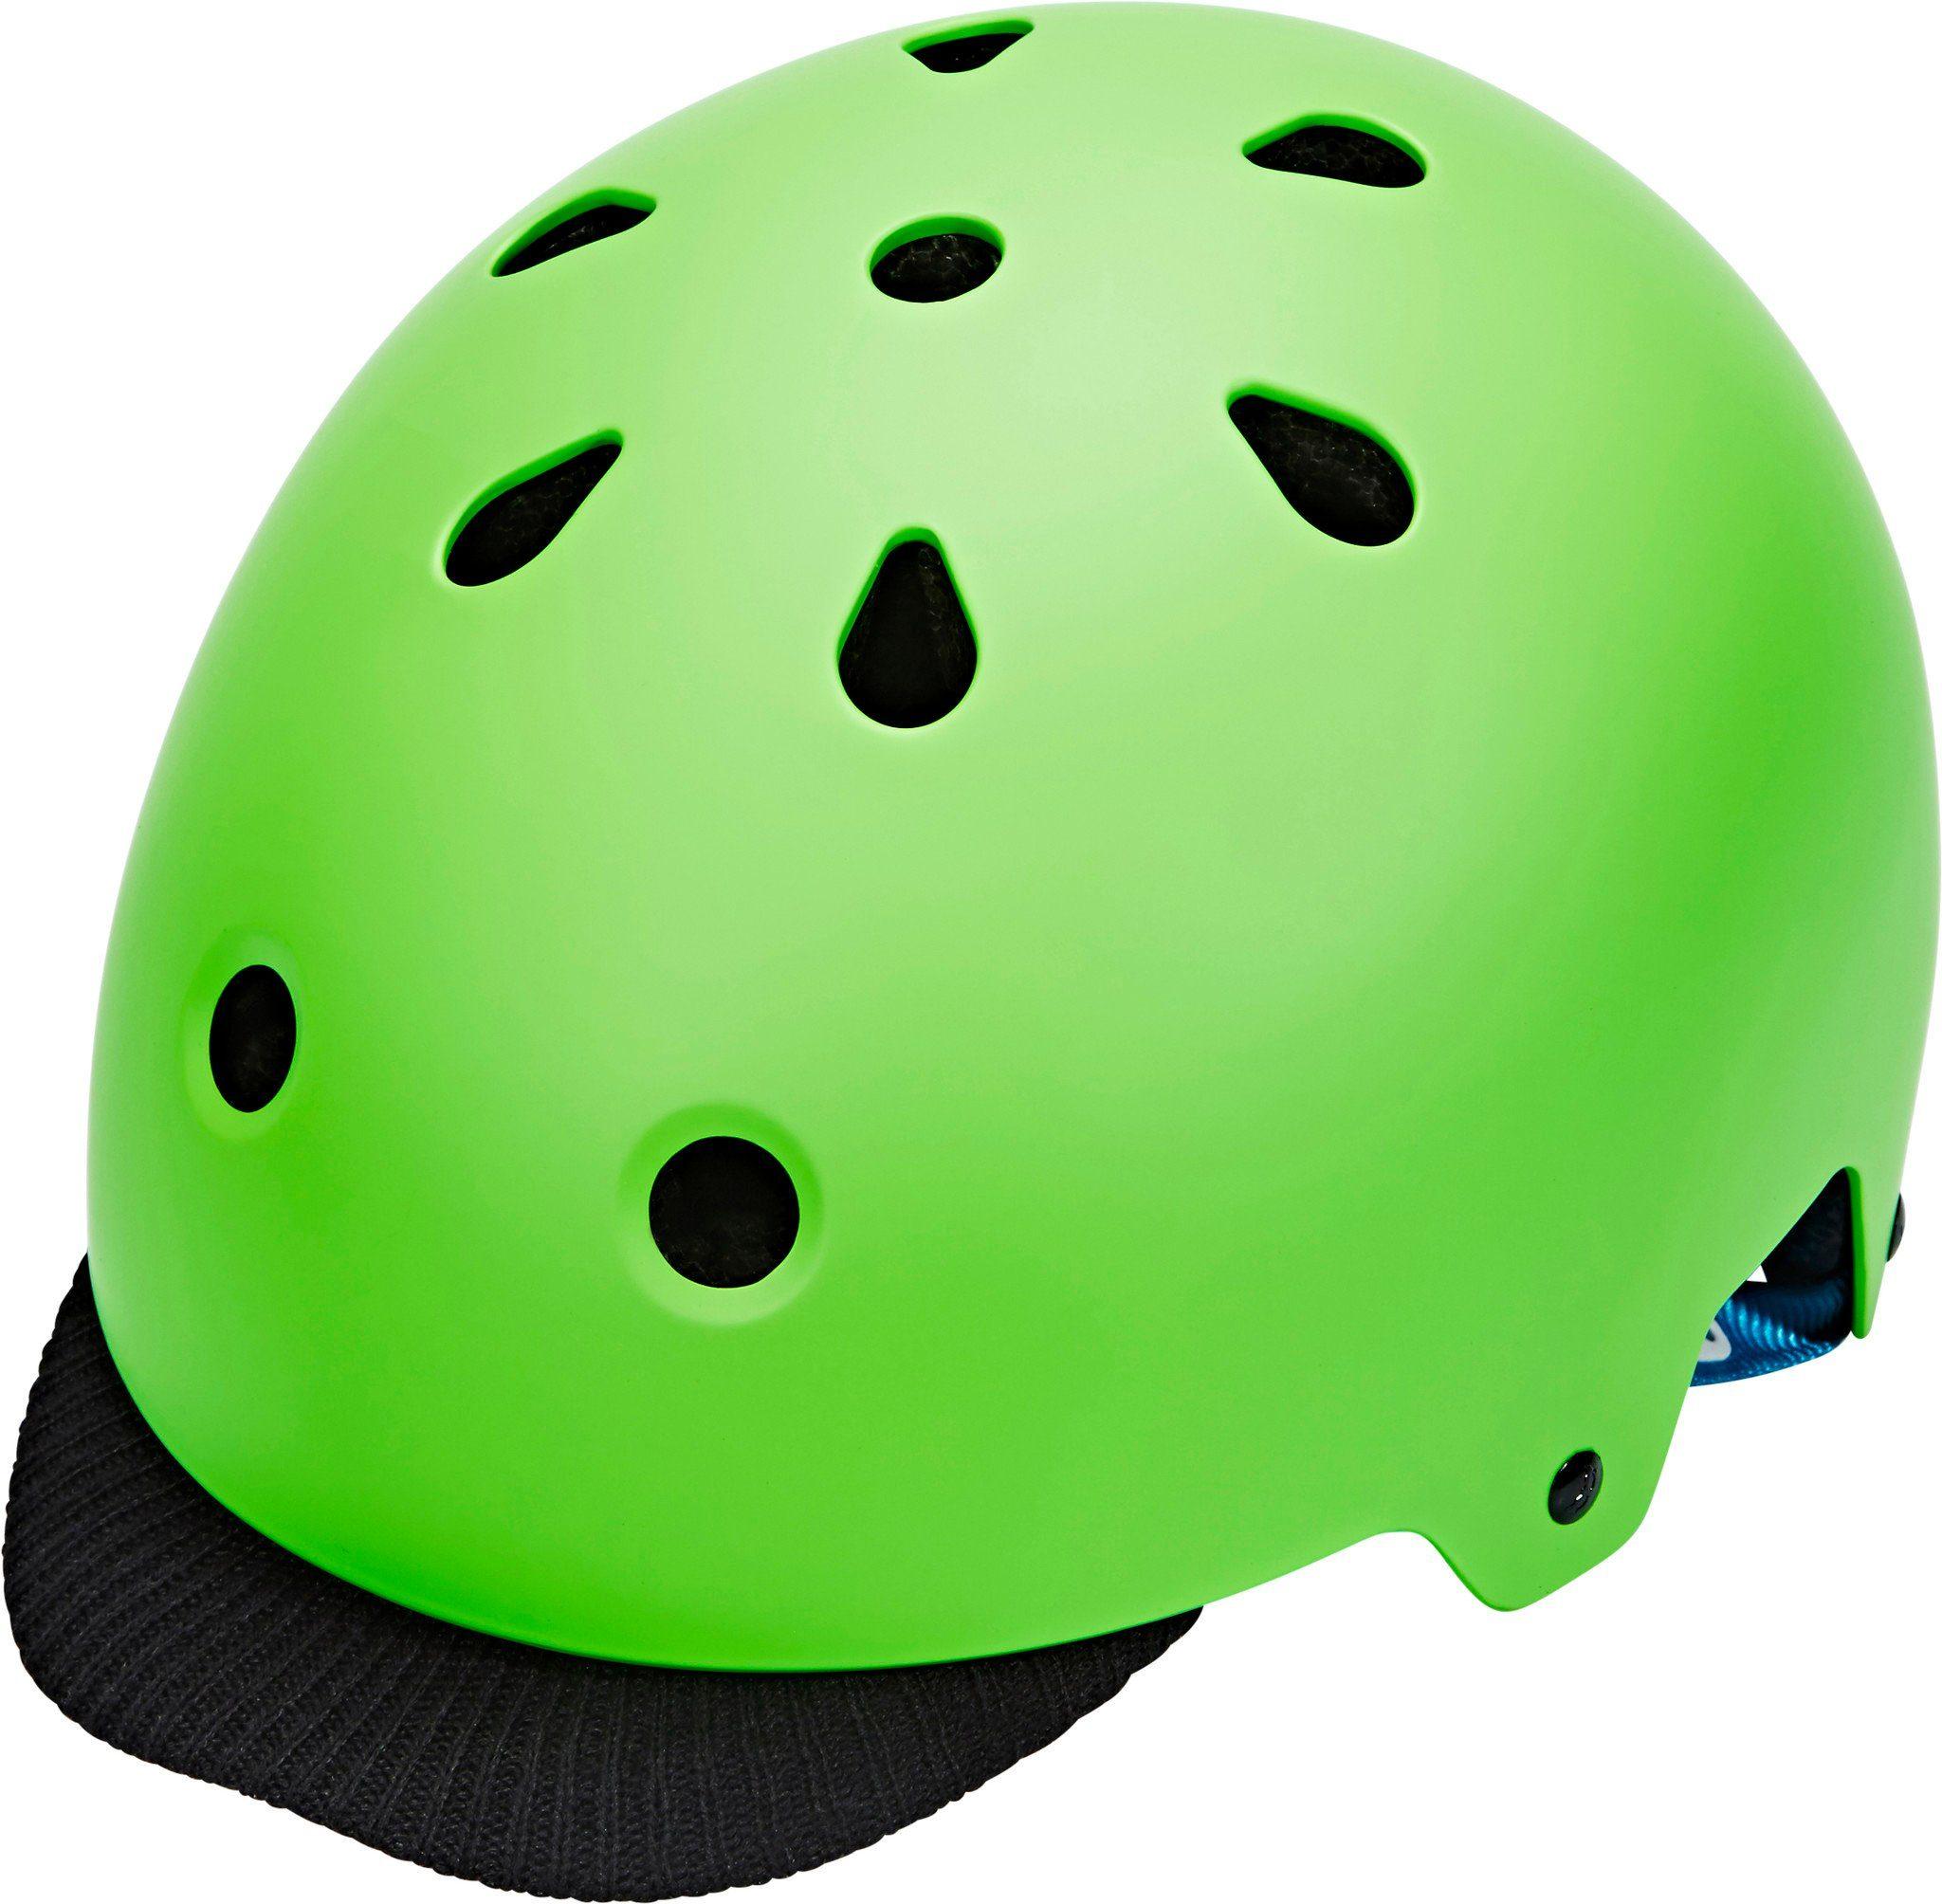 Kali Fahrradhelm »Saha Commuter Helm«